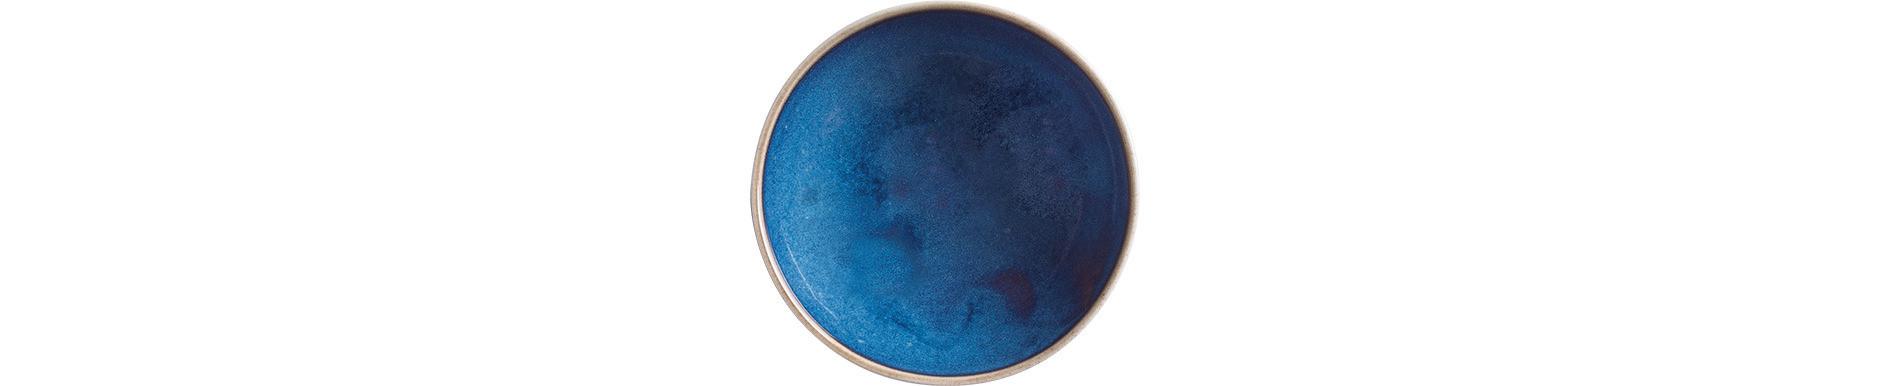 Homestyle, Schälchen ø 70 mm / 0,05 l atlantic blue